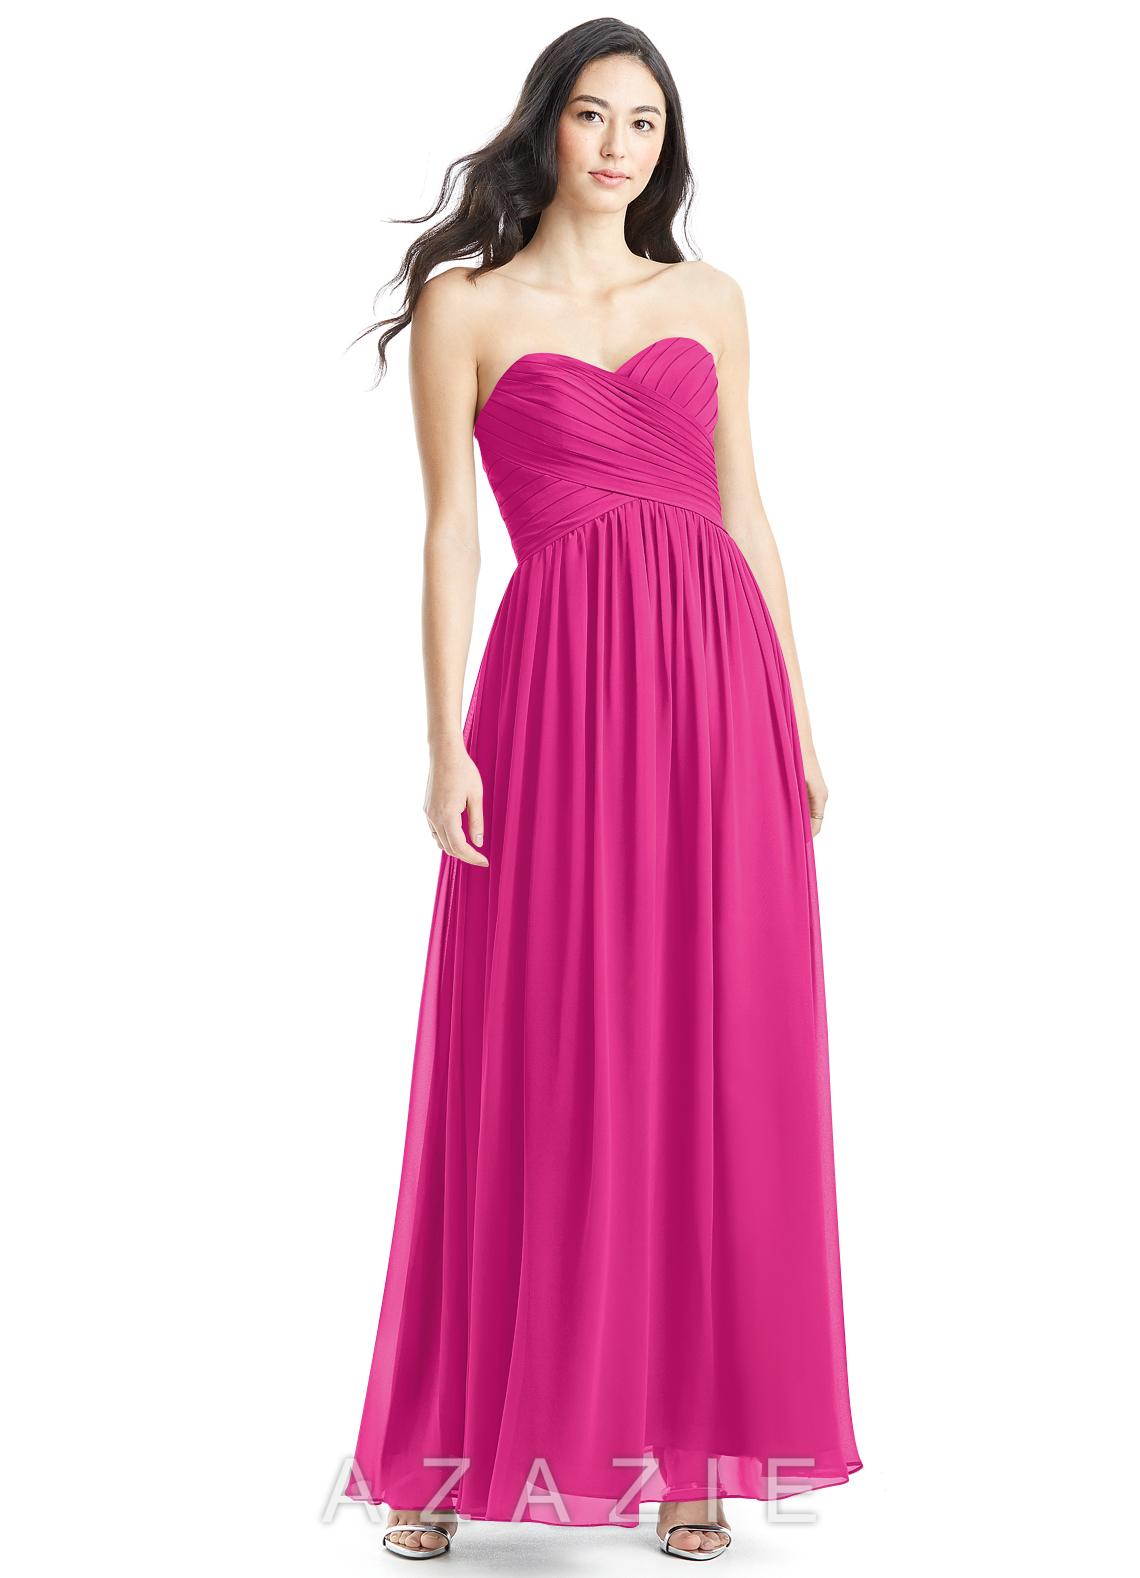 Azazie kristen bridesmaid dress azazie color fuchsia ombrellifo Image collections